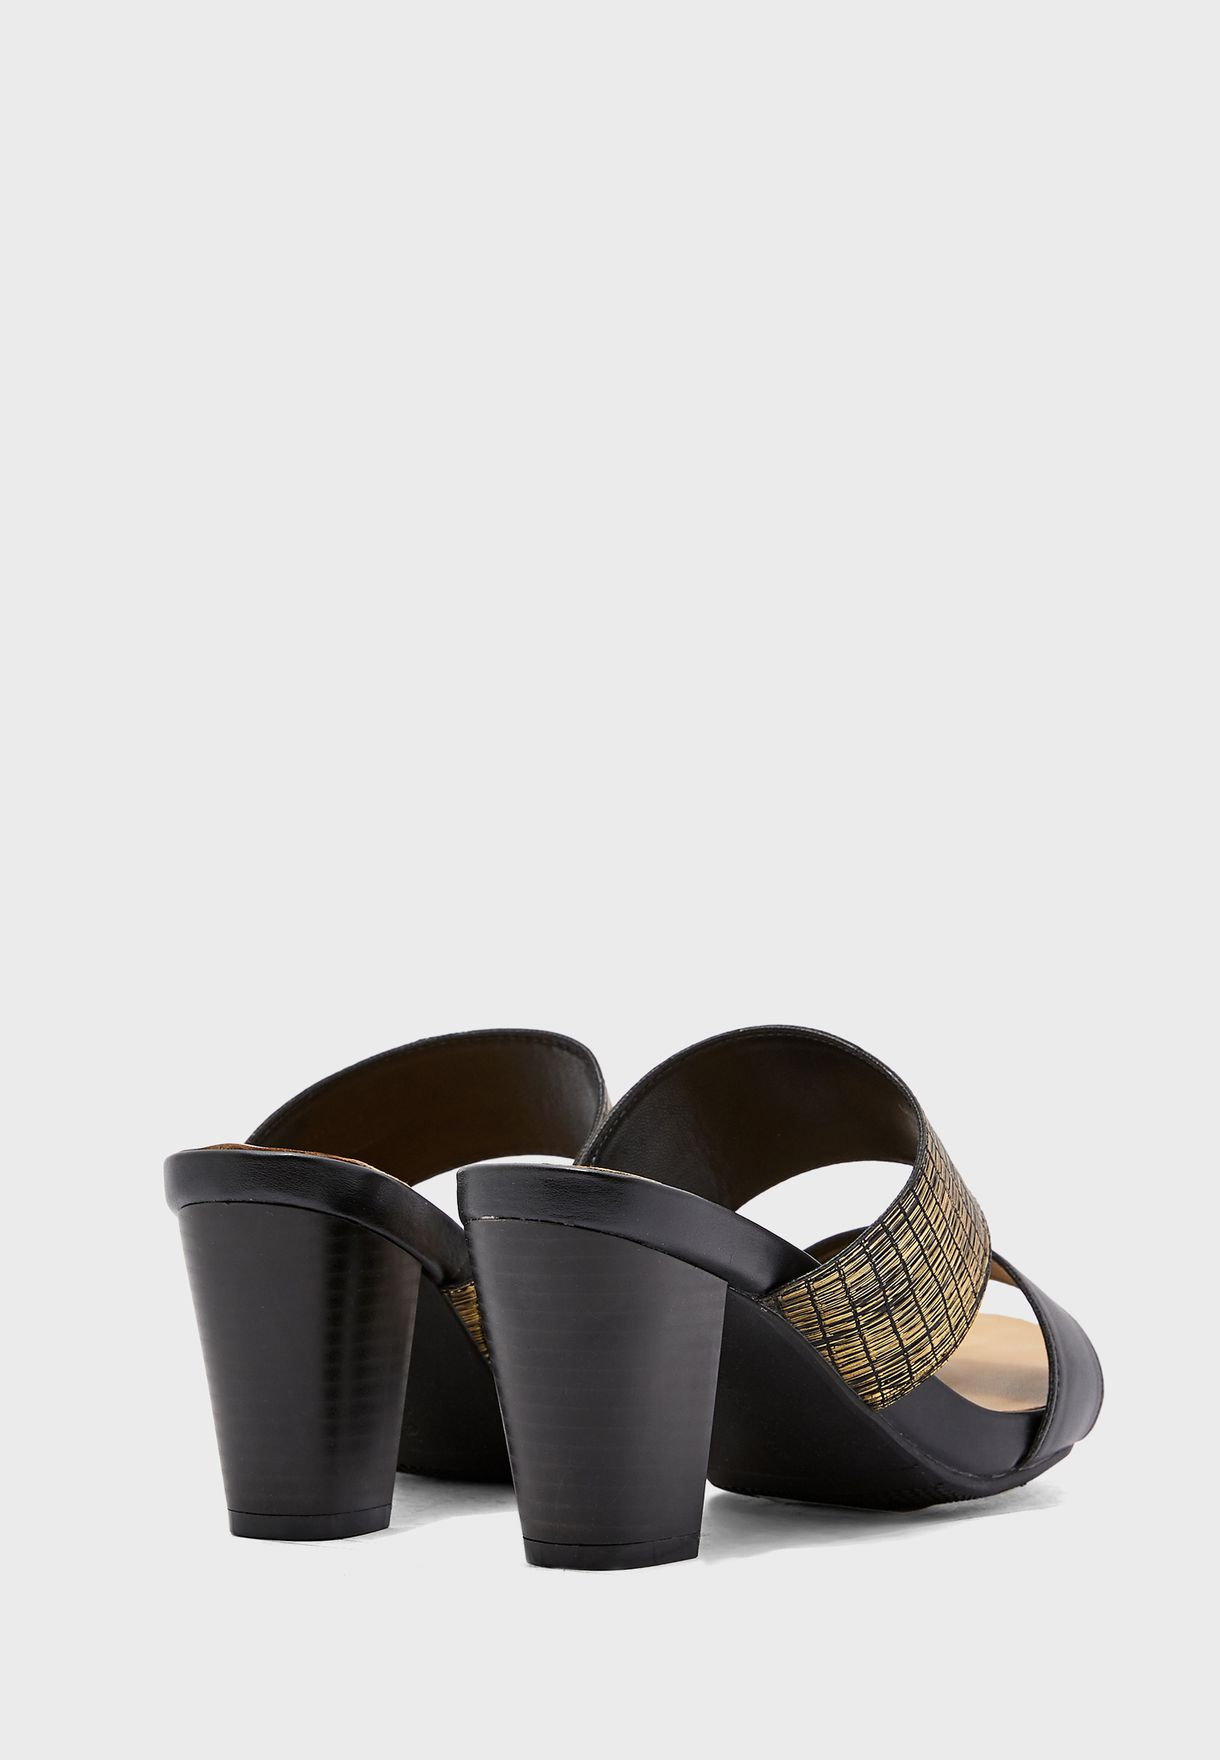 Double Strap High Heel Sandal